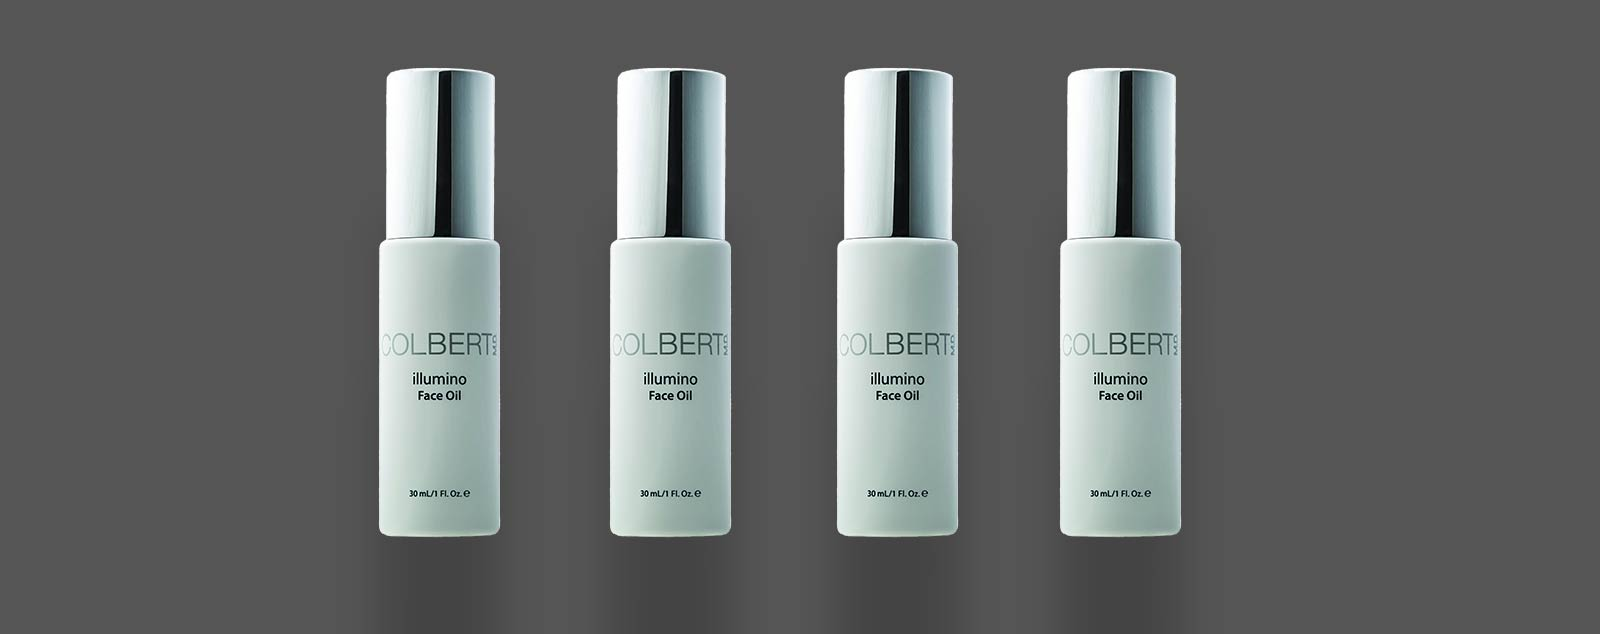 4 bottles illumino face oil by colbert md